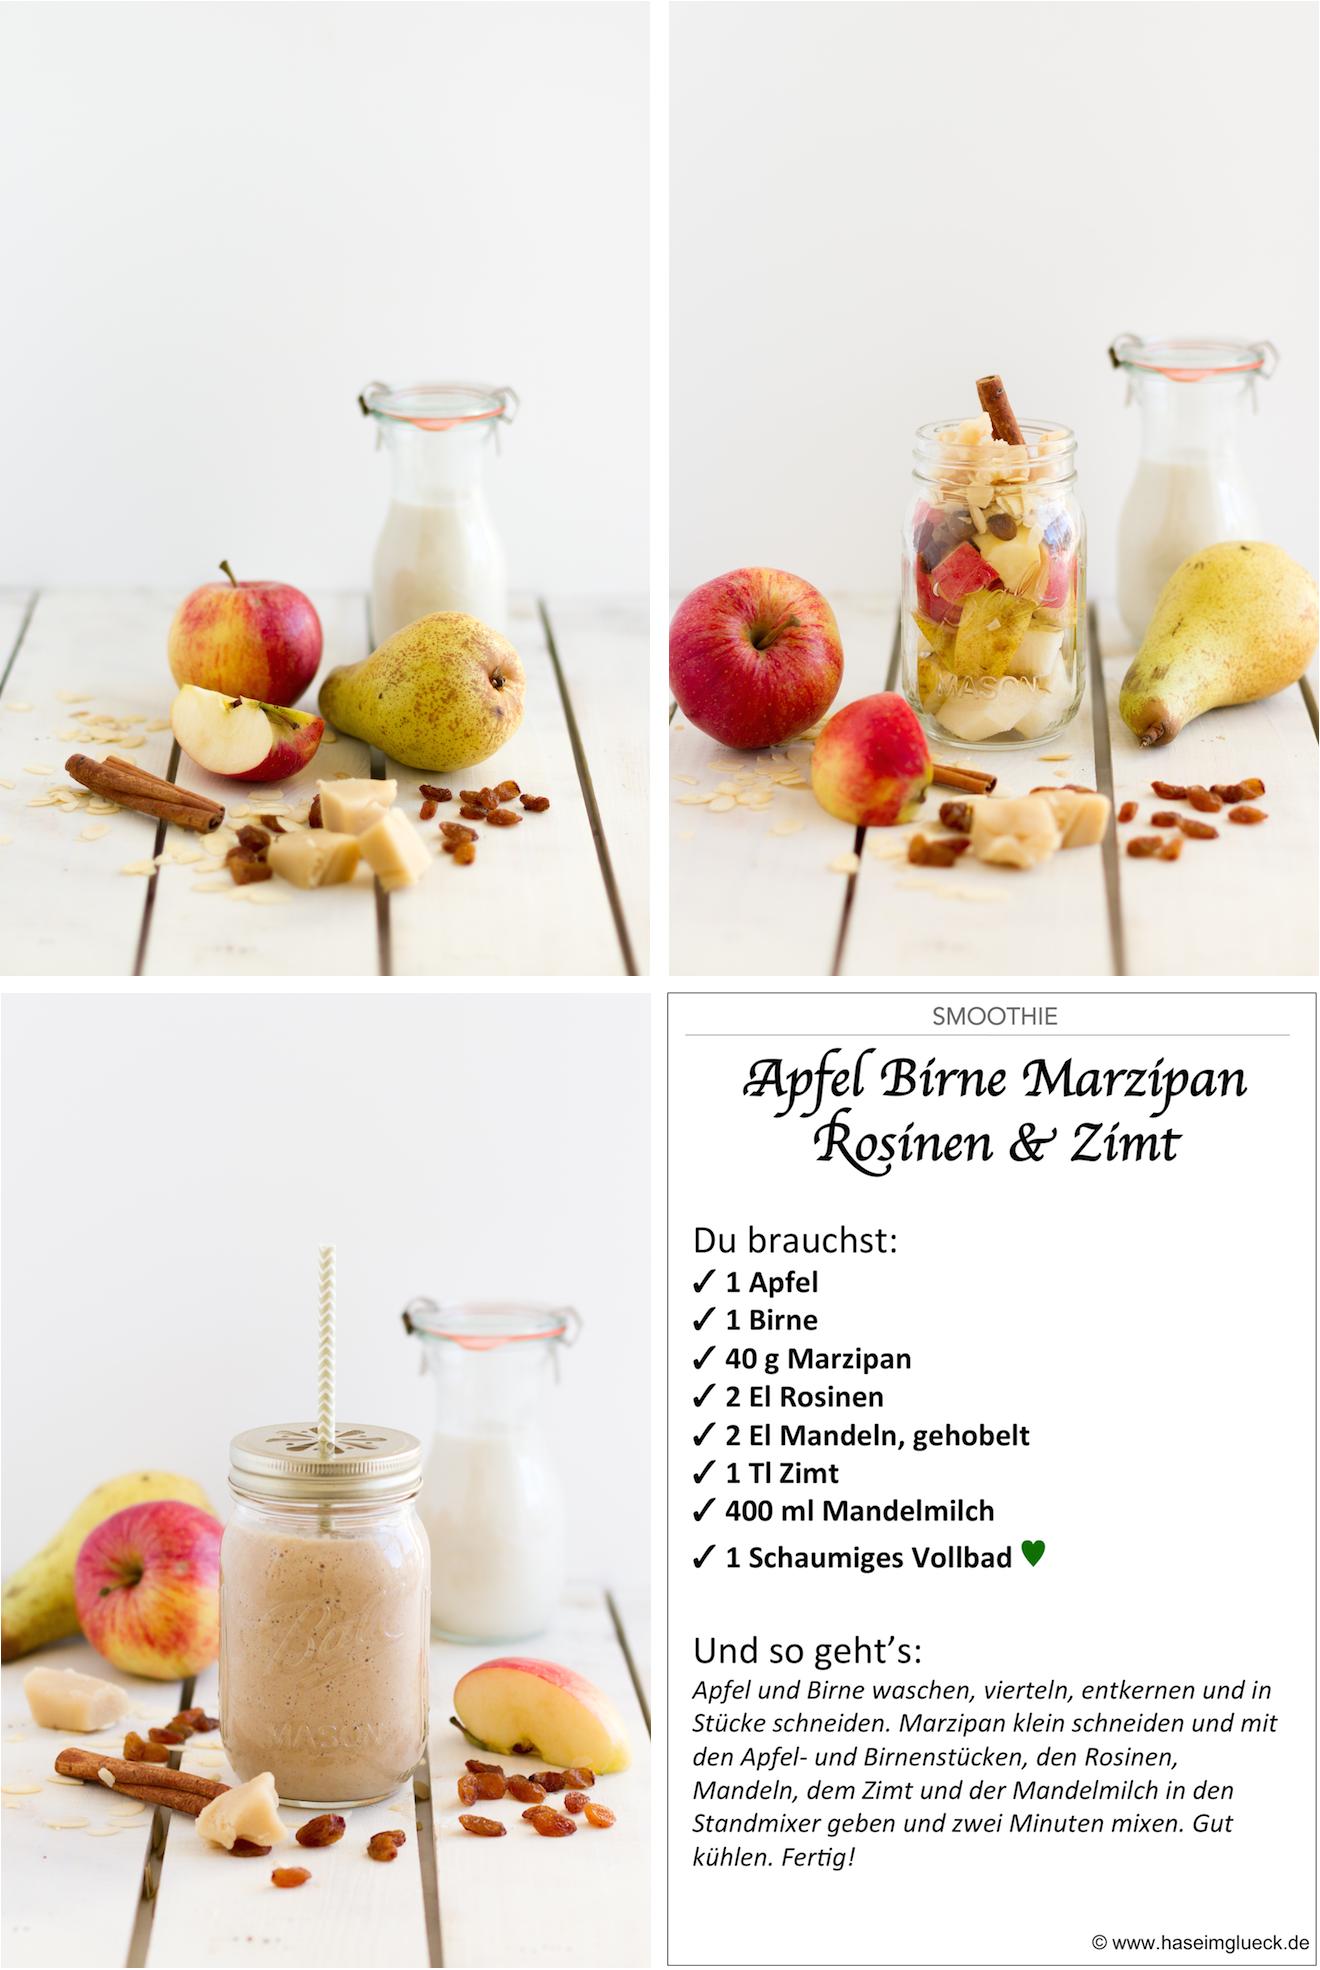 SMOOTHIE: Apfel, Birne, Marzipan & Zimt | Hase im Glück